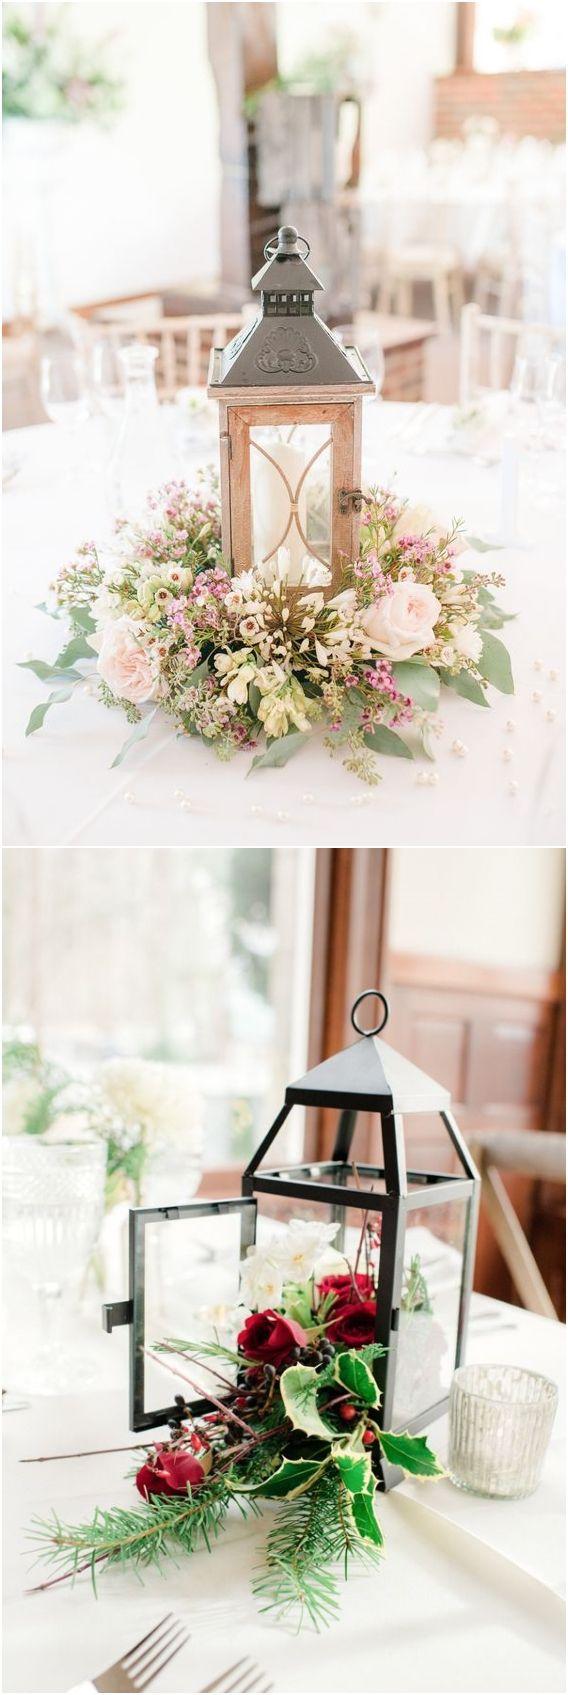 60 Insanely Wedding Centerpiece Ideas You\'ll Love | Lantern wedding ...